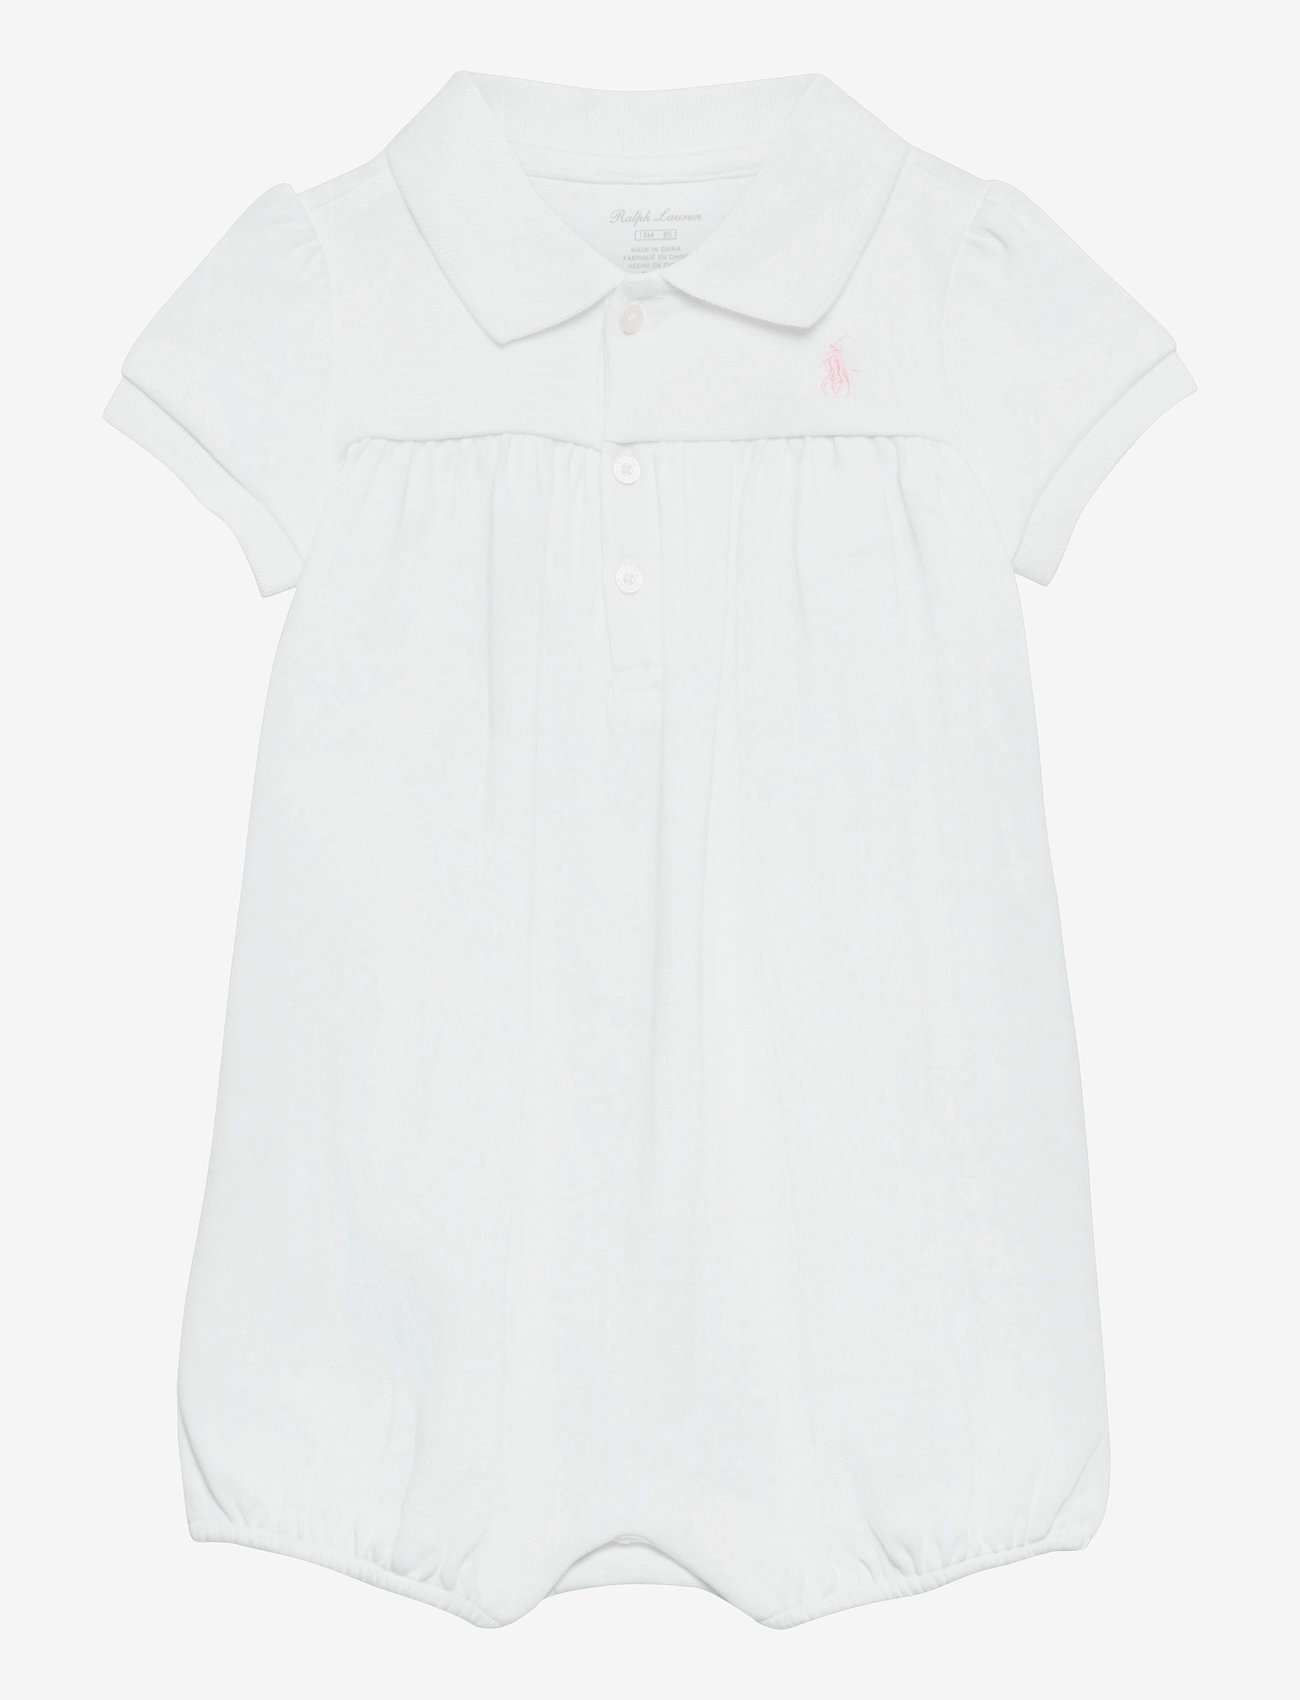 Ralph Lauren Baby - Interlock Bubble Shortall - short-sleeved - white - 0